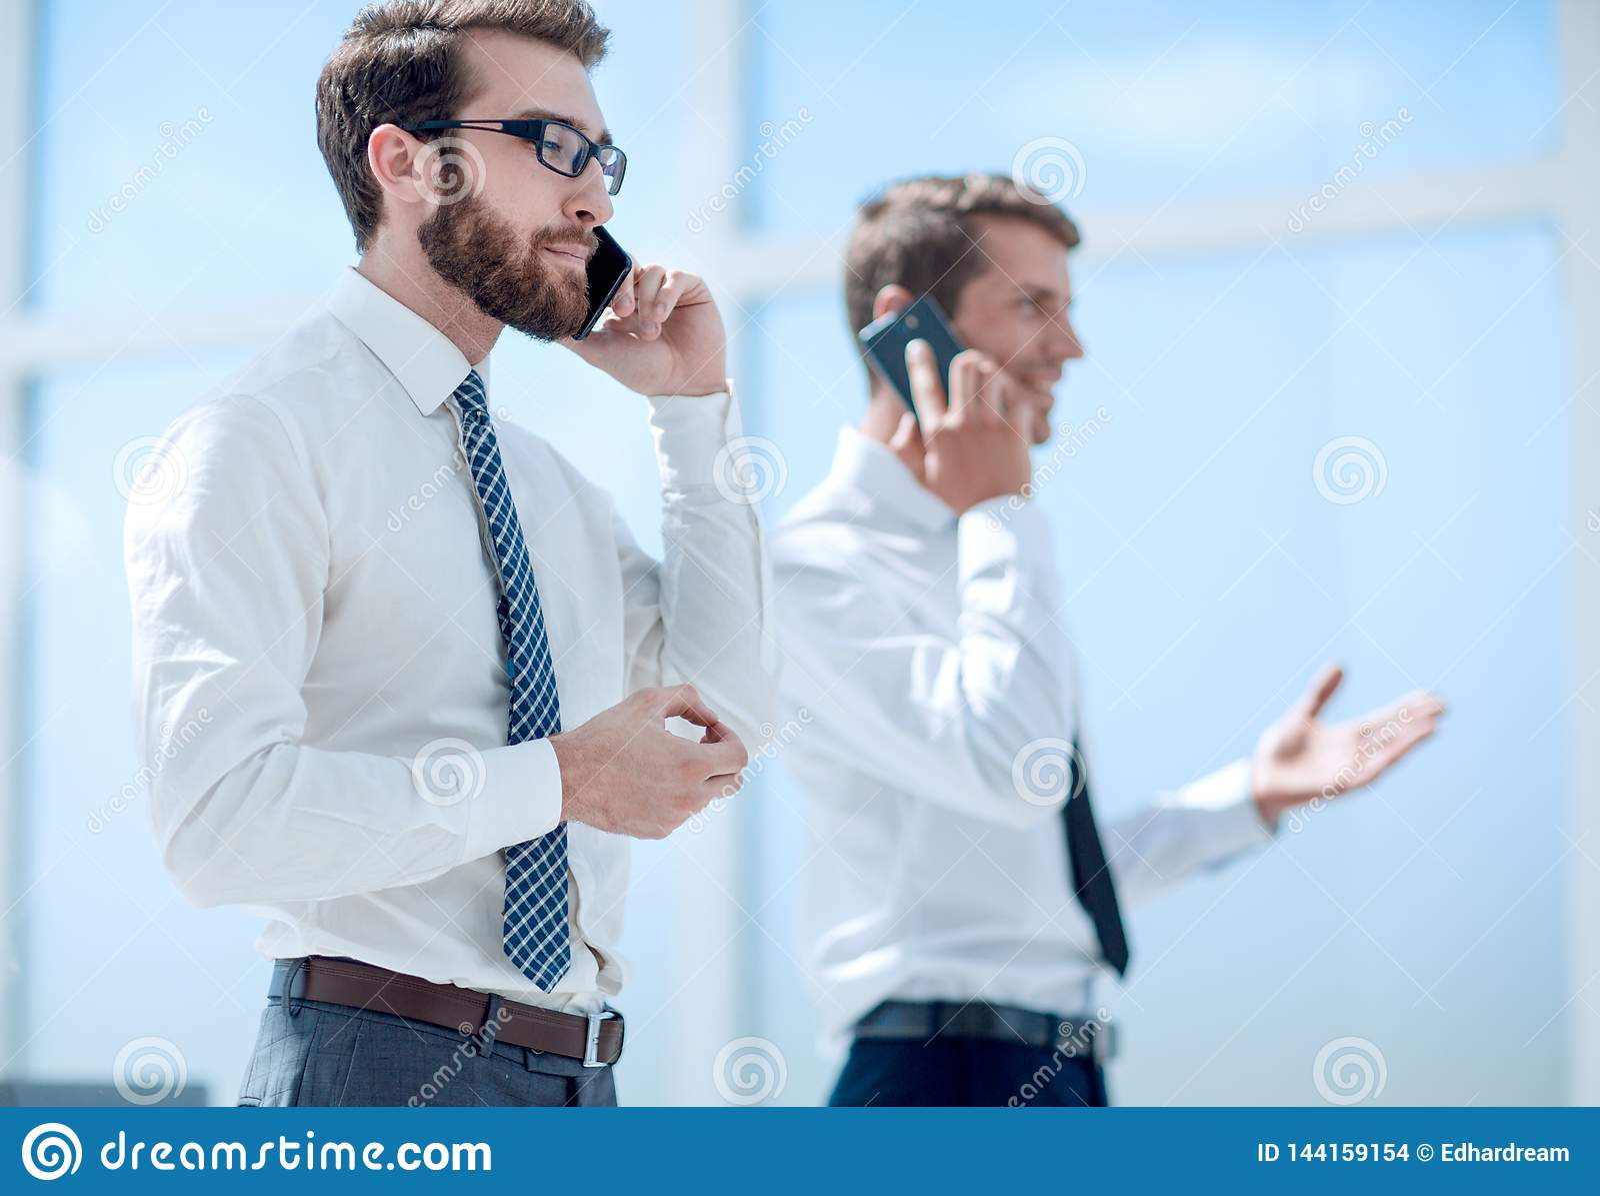 Business partners communicating using smartphones